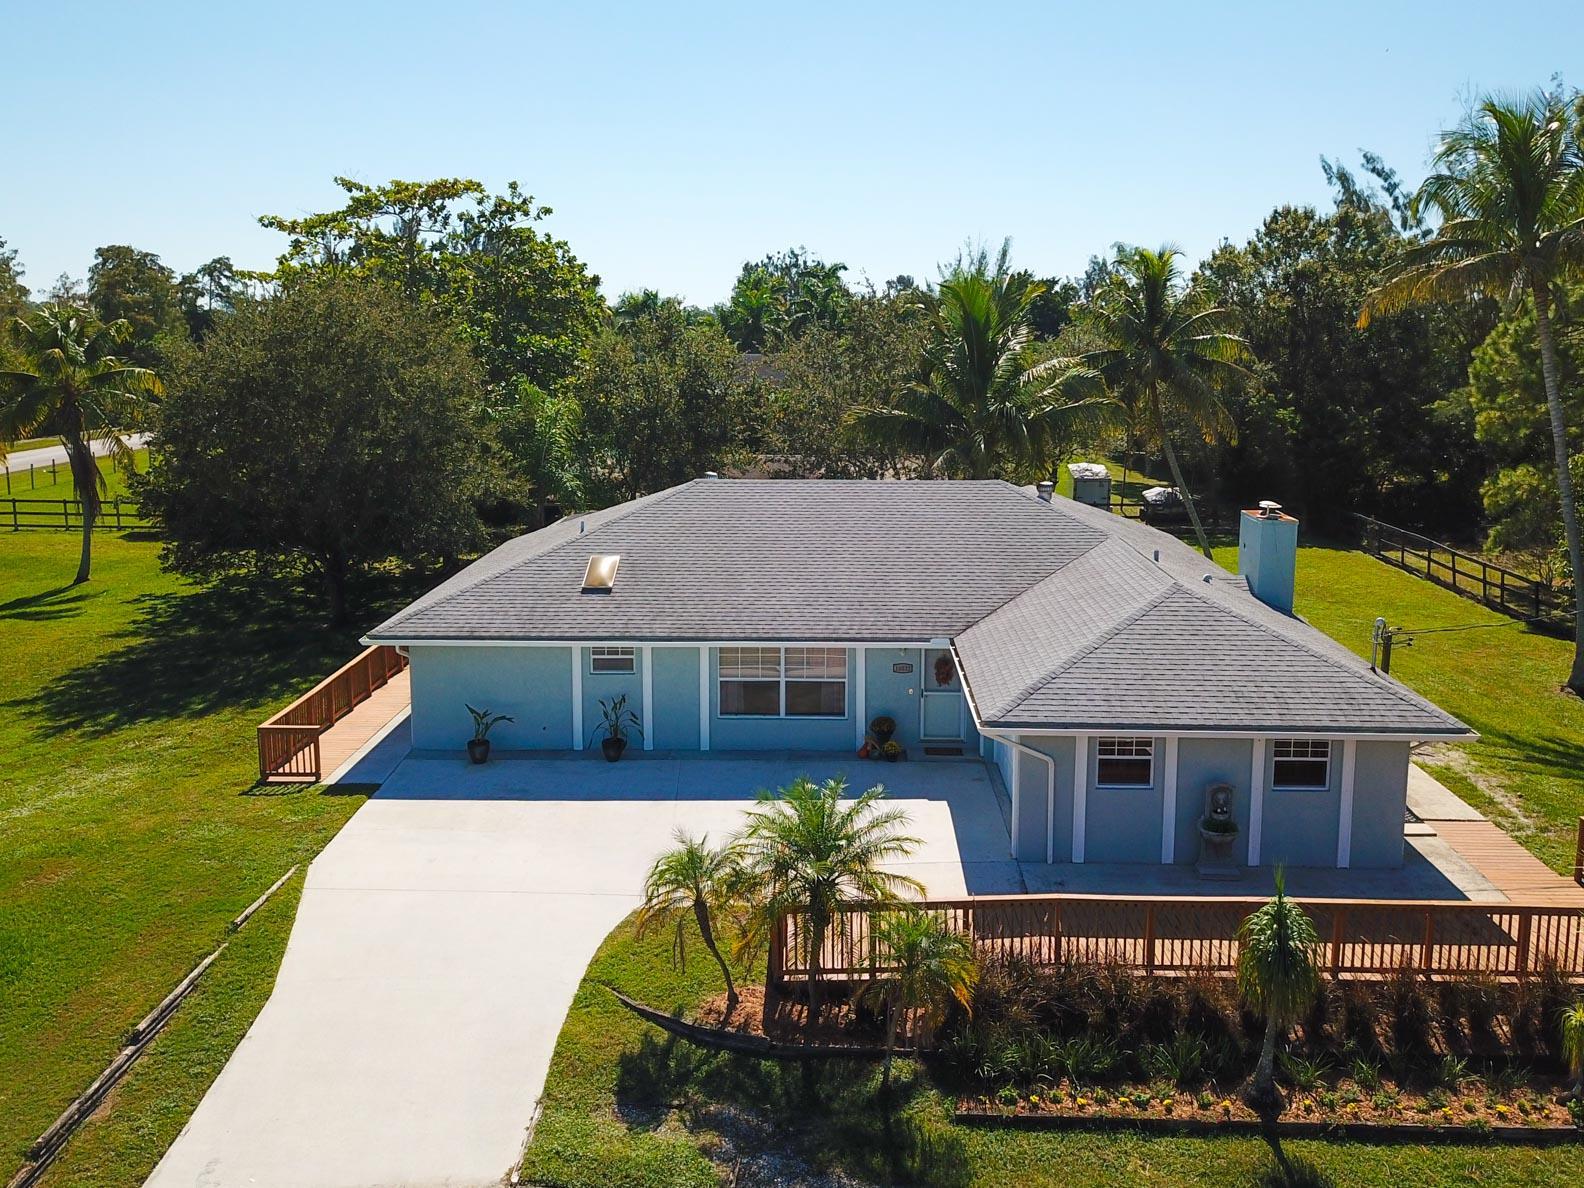 16032 Aintree Drive, Loxahatchee, Florida 33470, 3 Bedrooms Bedrooms, ,2 BathroomsBathrooms,Single Family,For Sale,Royal Ascot Estates,Aintree,RX-10477362